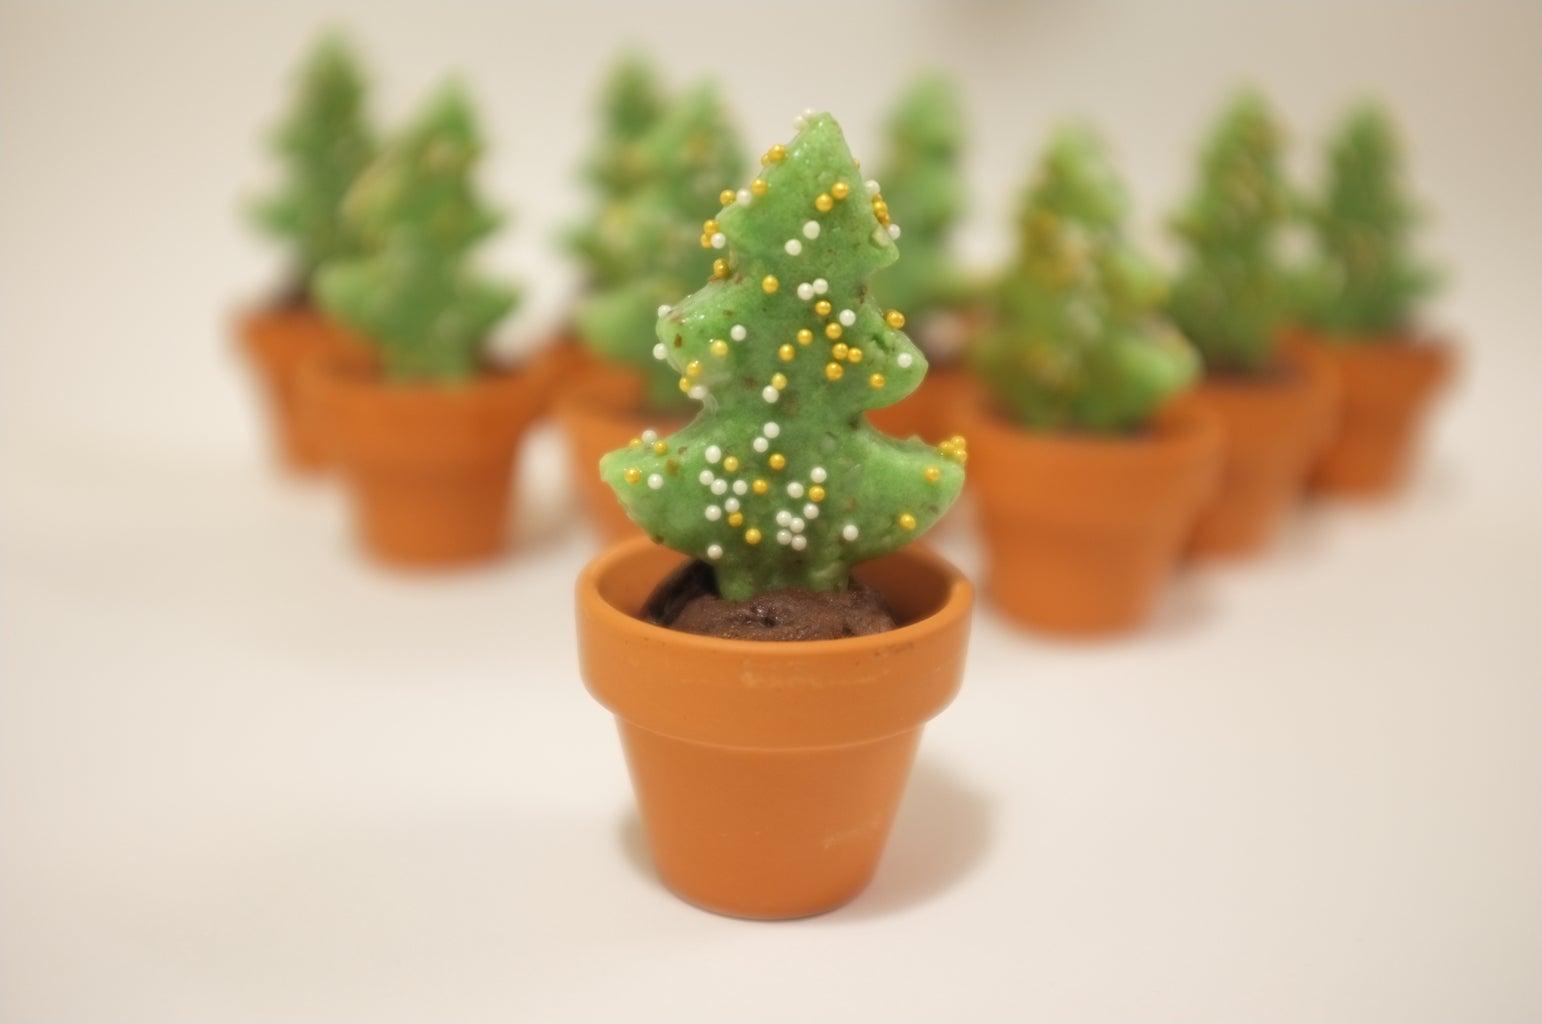 Plant Tree Into Soil